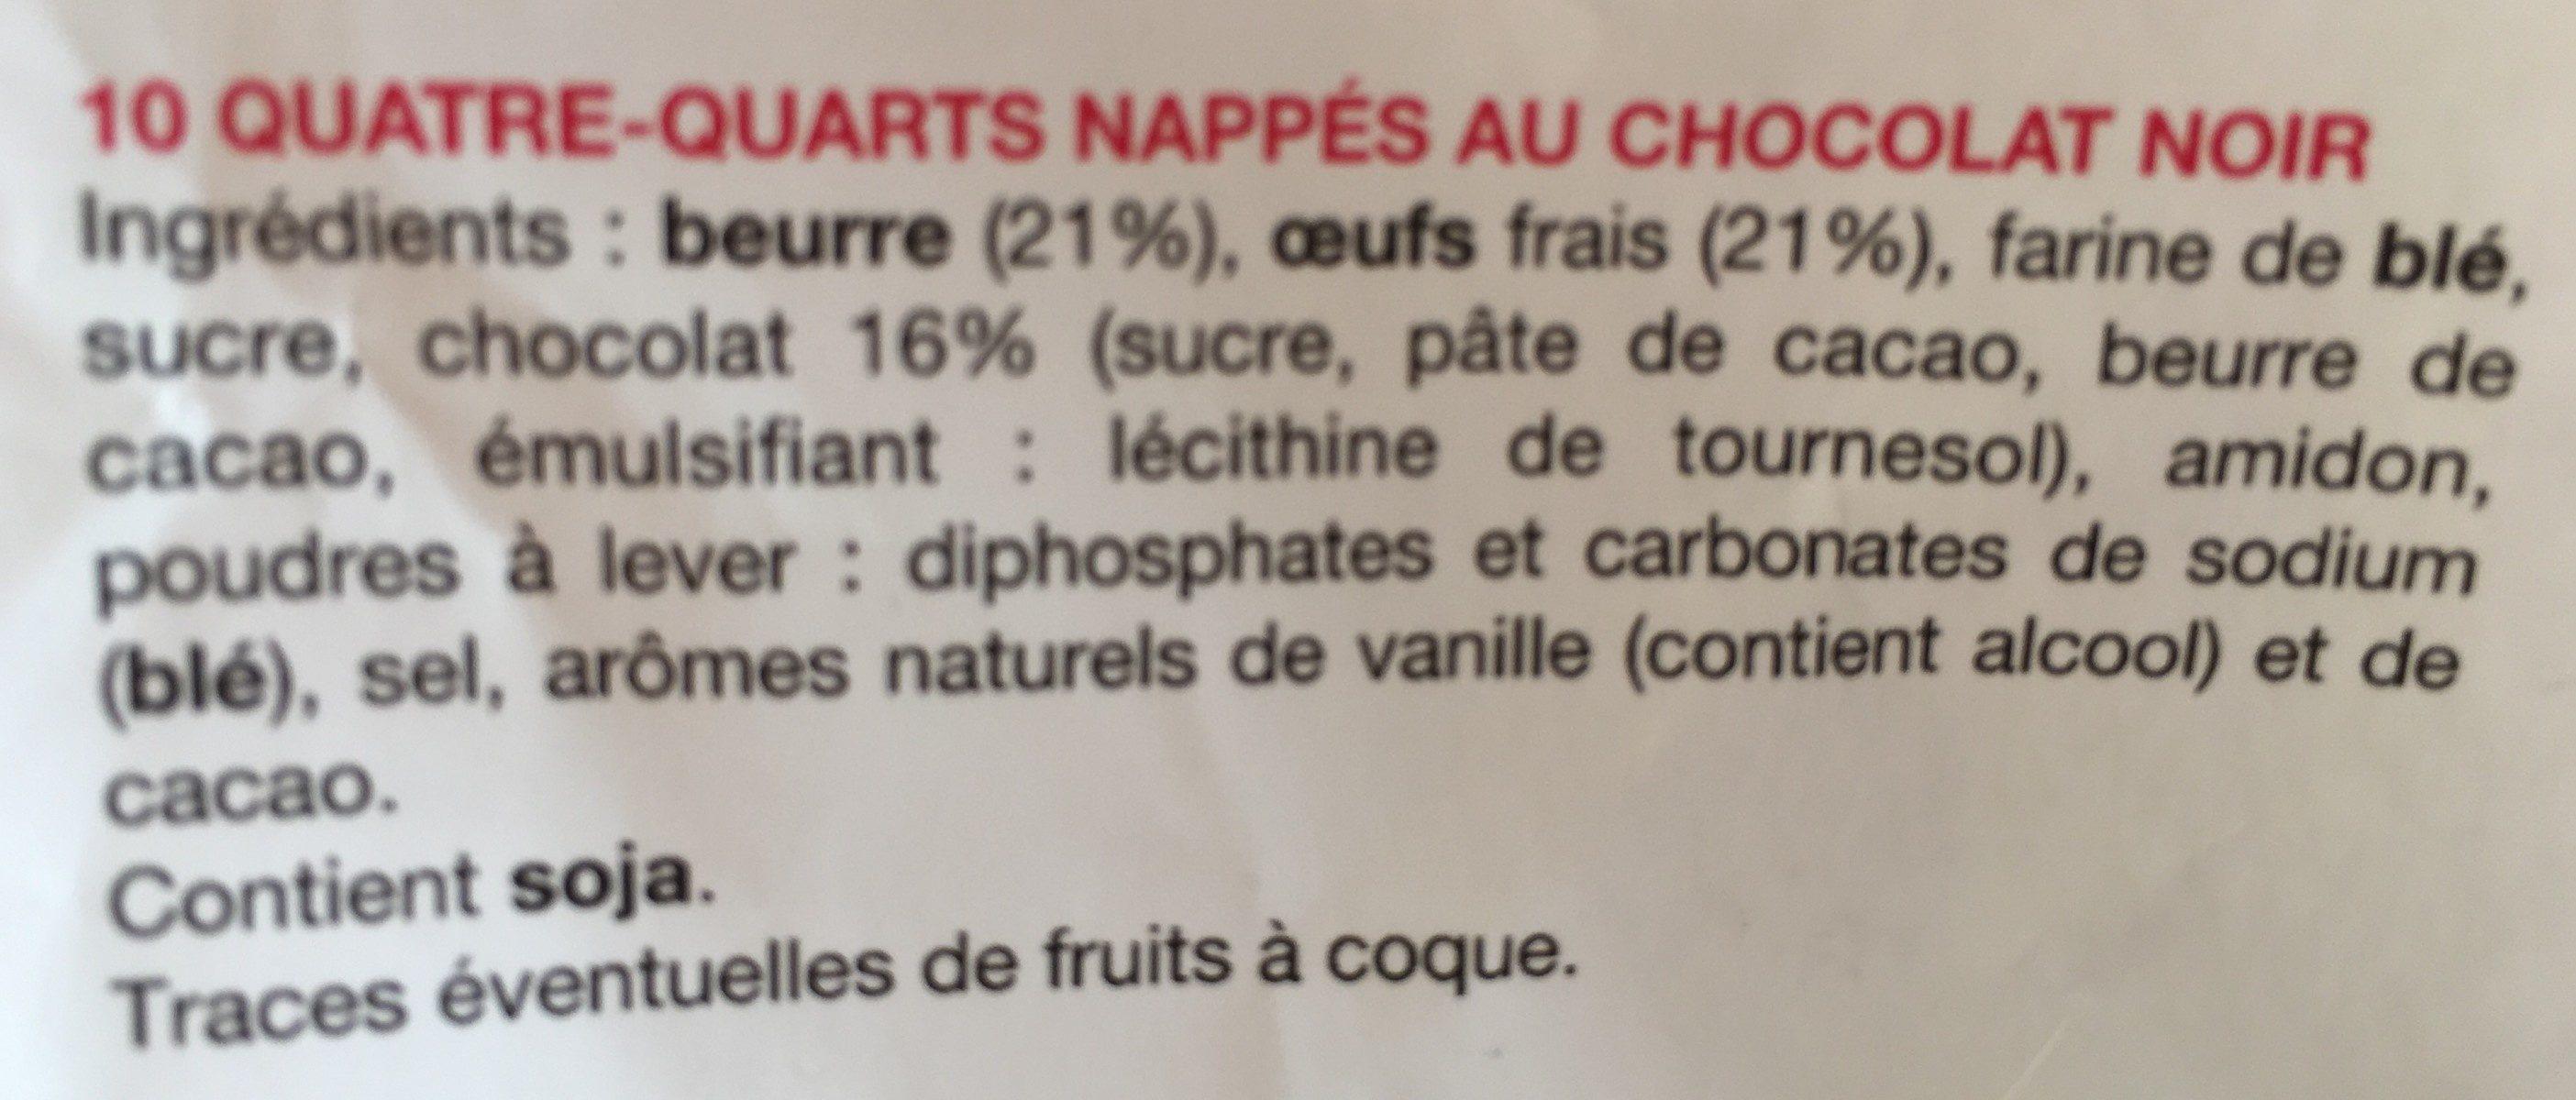 le petit quatre-quarts chocolat noir - Ingrediënten - fr